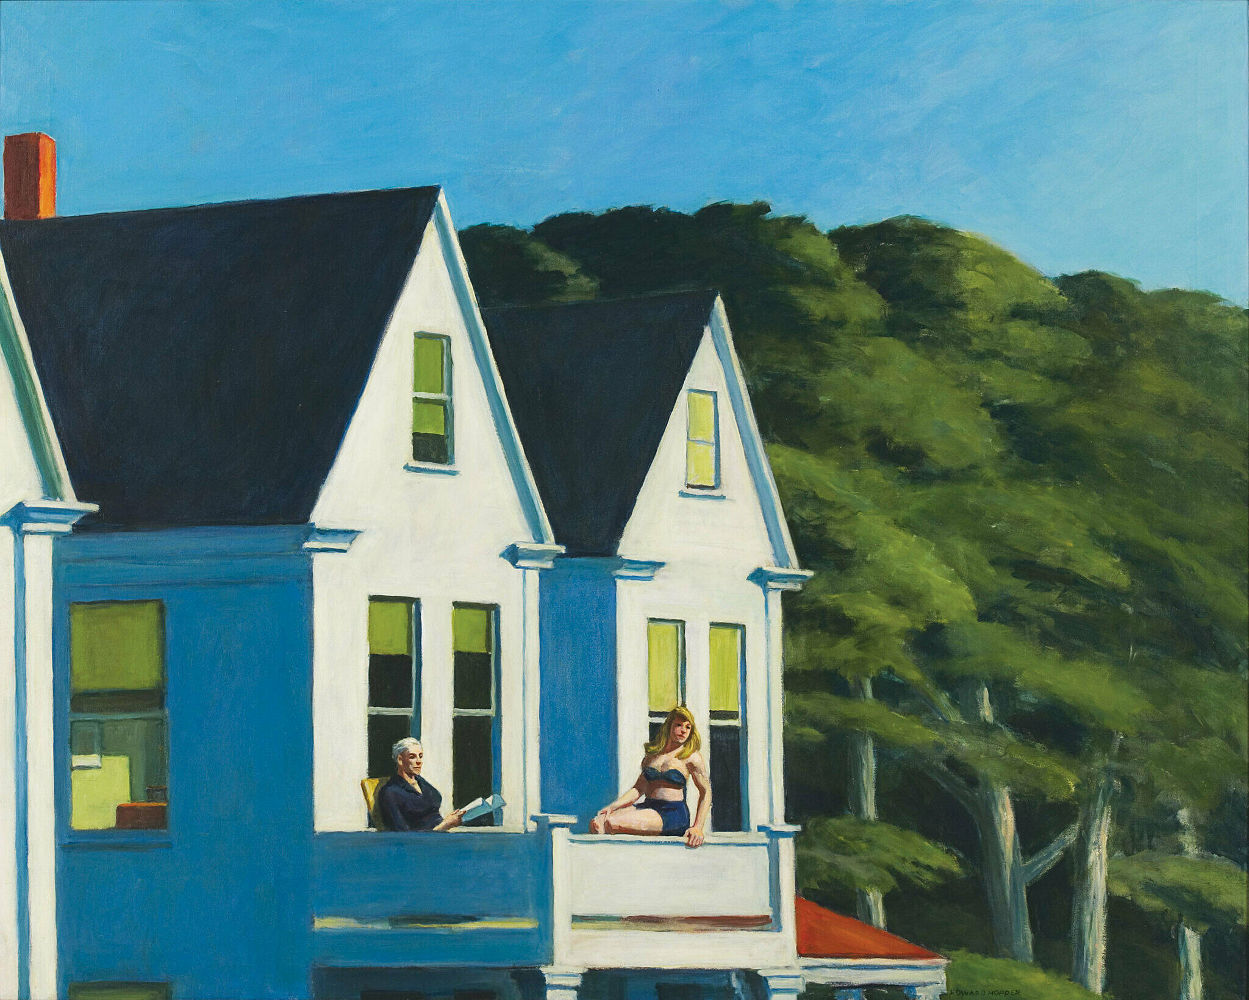 Second Story Sunlight (1960), Ιδιωτική Συλλογή